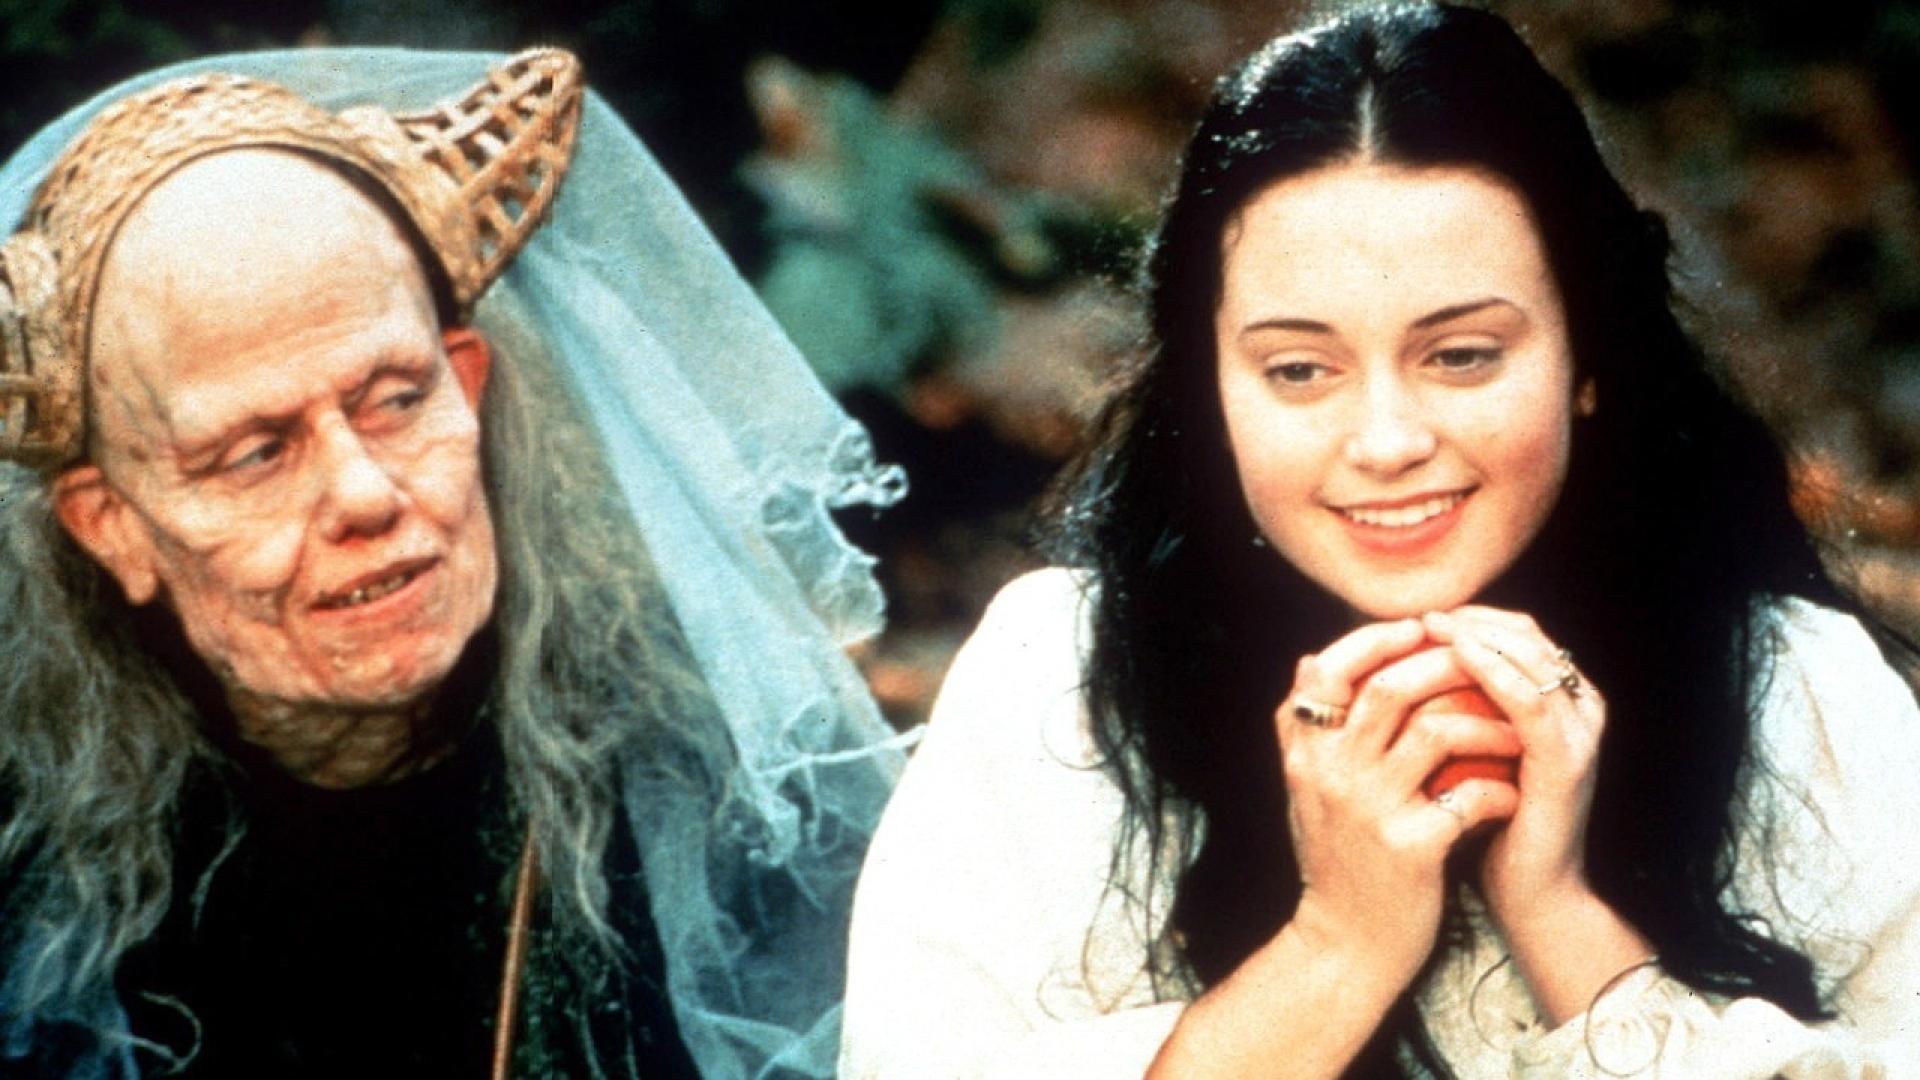 Snow White: A Tale of Terror - Hófehérke: A terror meséje (1997)